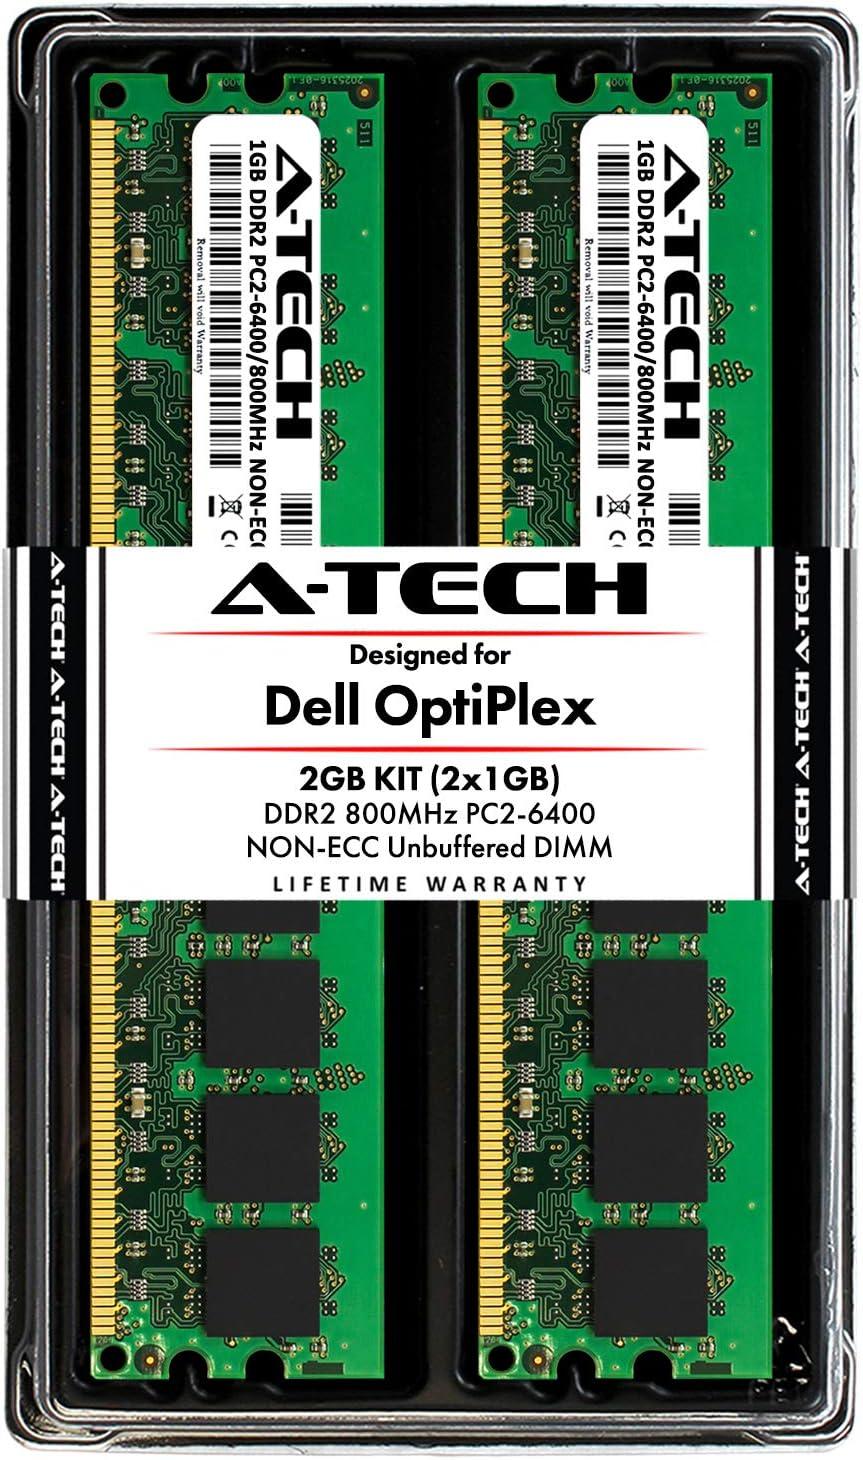 A-Tech 2GB (2X 1GB) Memory RAM Kit for Dell OptiPlex 960, 760, 755, 745, 740, 360, 330, 160, (MT, DT, SFF, USFF) - DDR2 800MHz PC2-6400 Non-ECC DIMM Modules